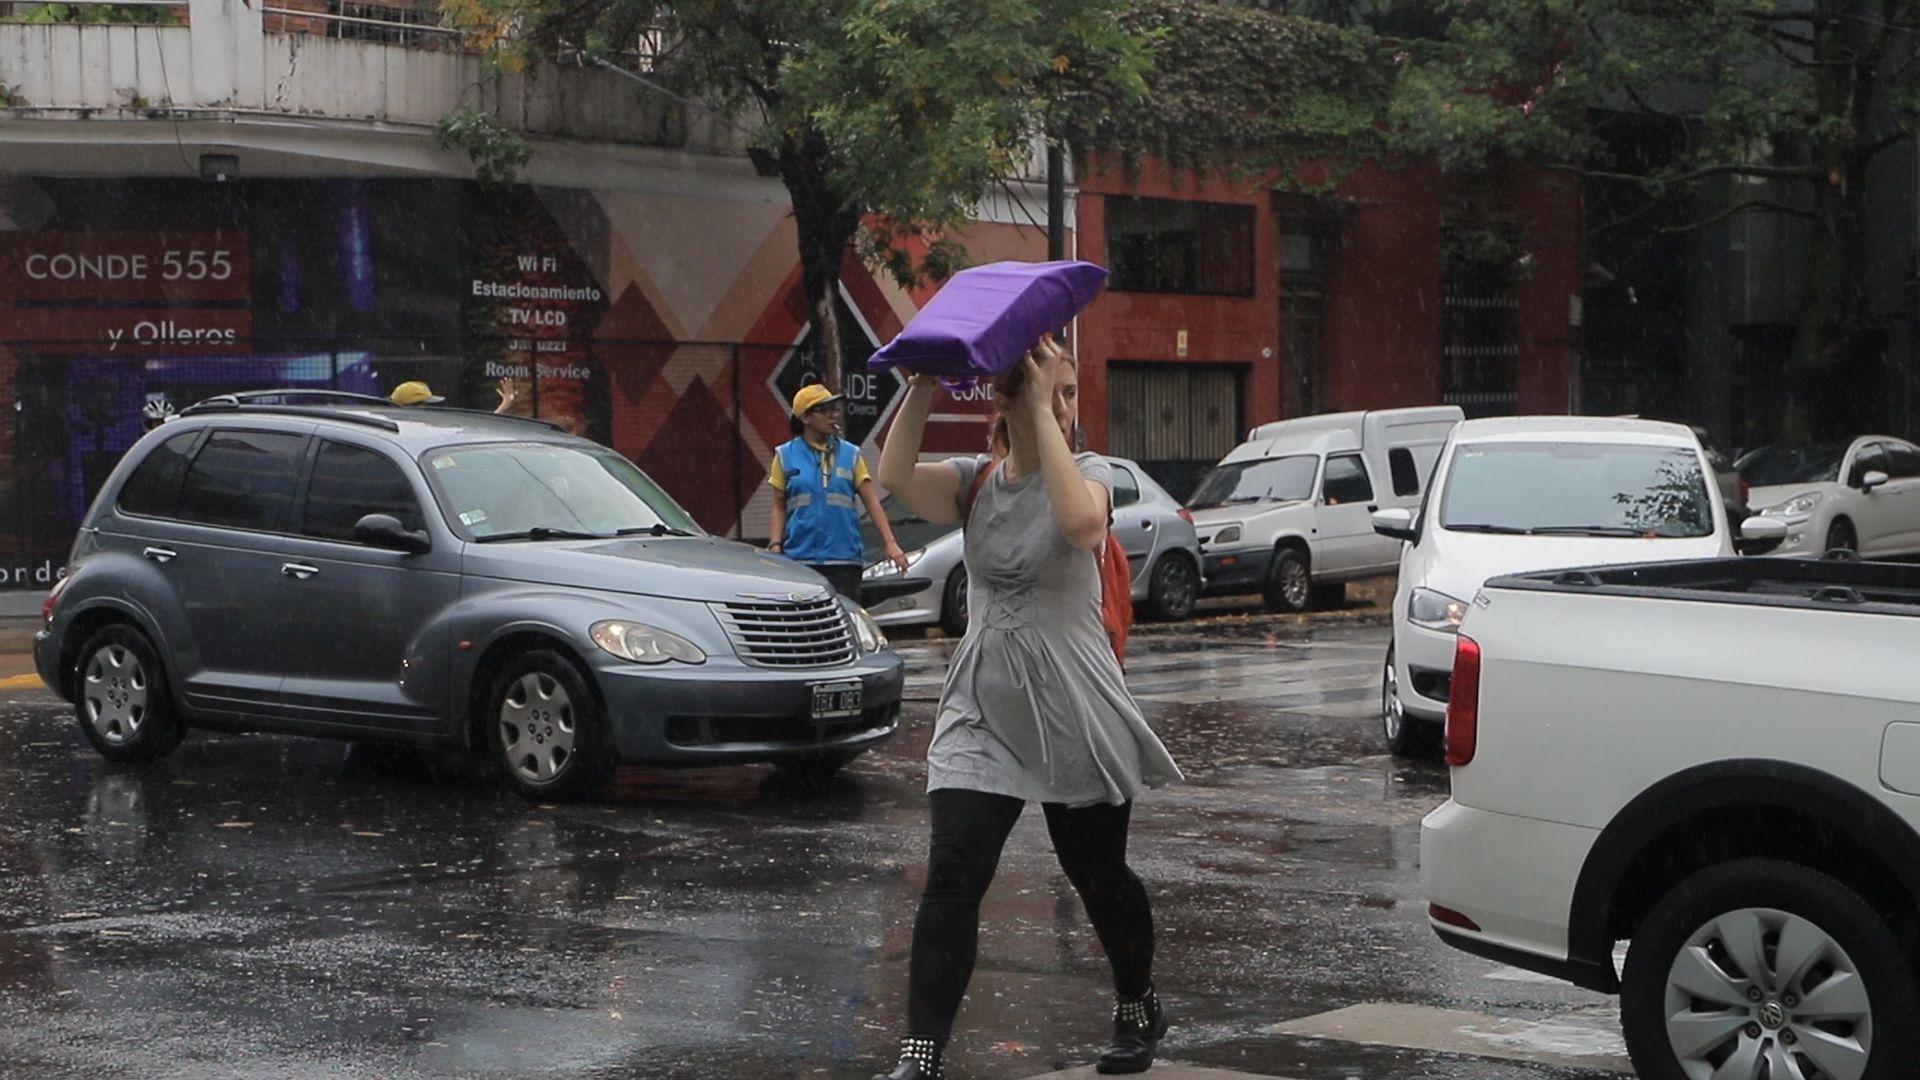 La lluvia trajo algo de alivio ante la ola de calor